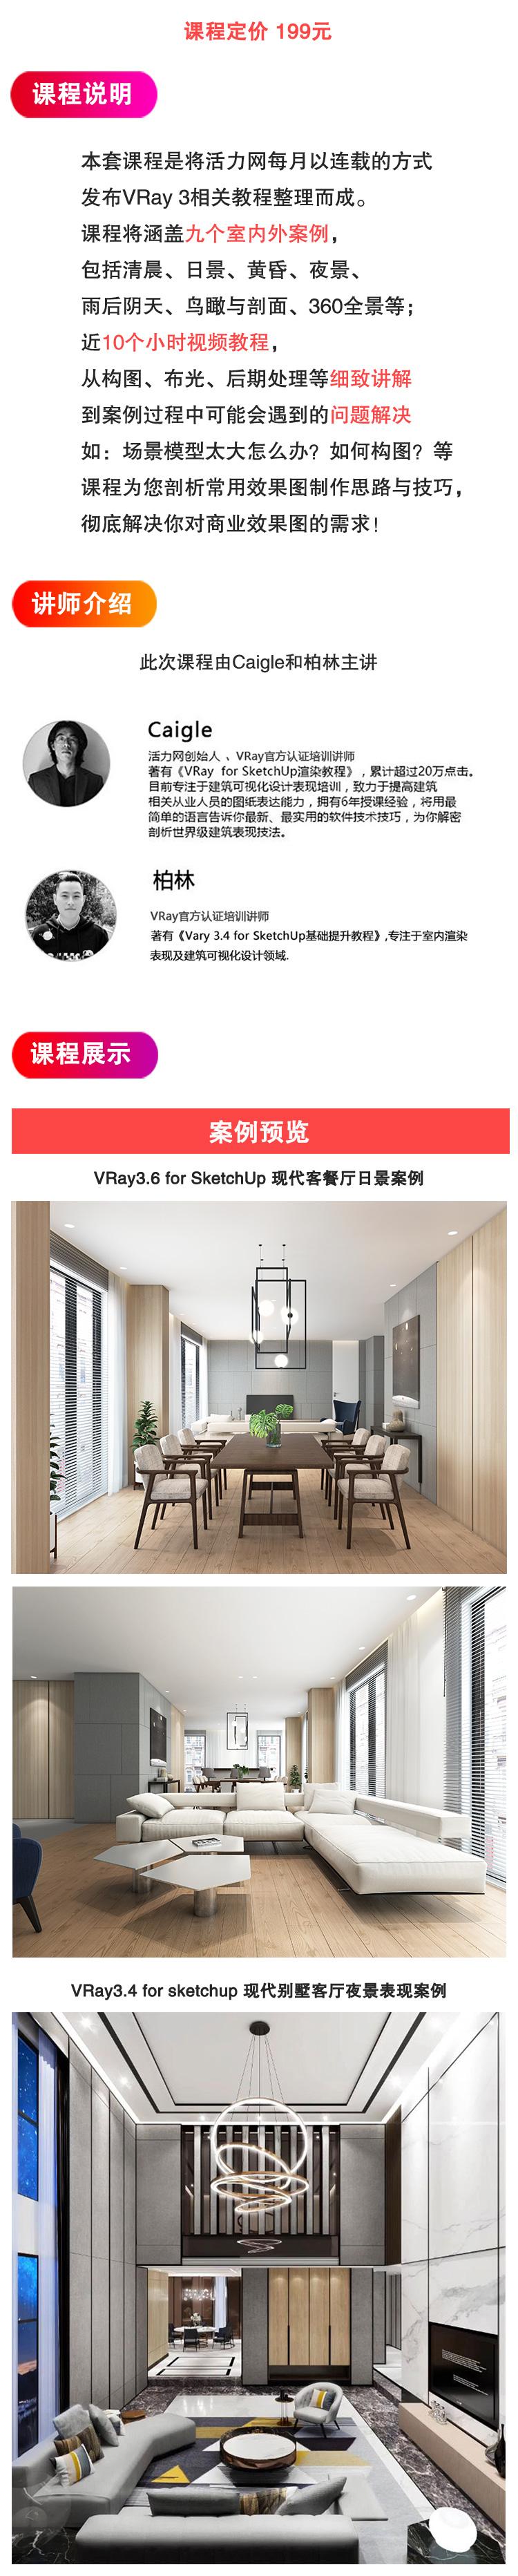 VRay 3 for SketchUp室内外中级案例教程合辑